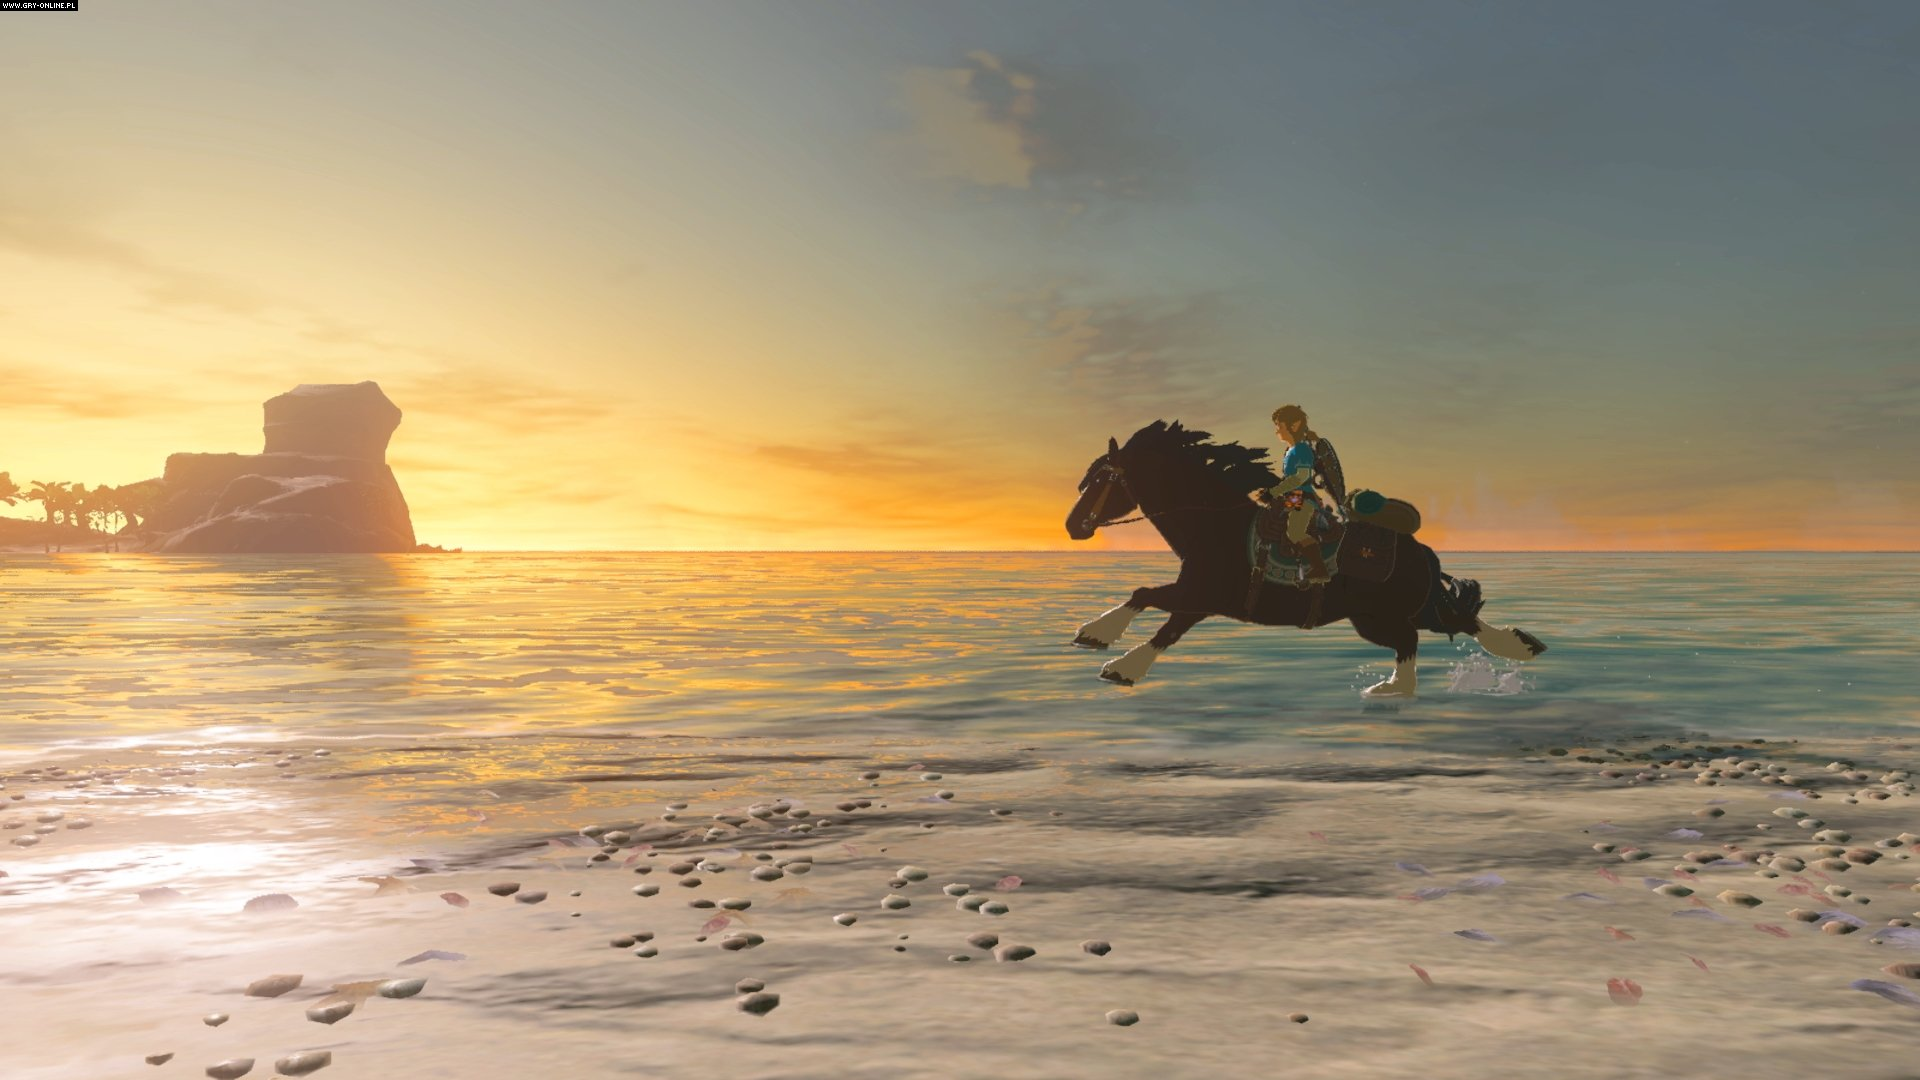 The Legend of Zelda: Breath of the Wild Switch Games Image 8/73, Nintendo